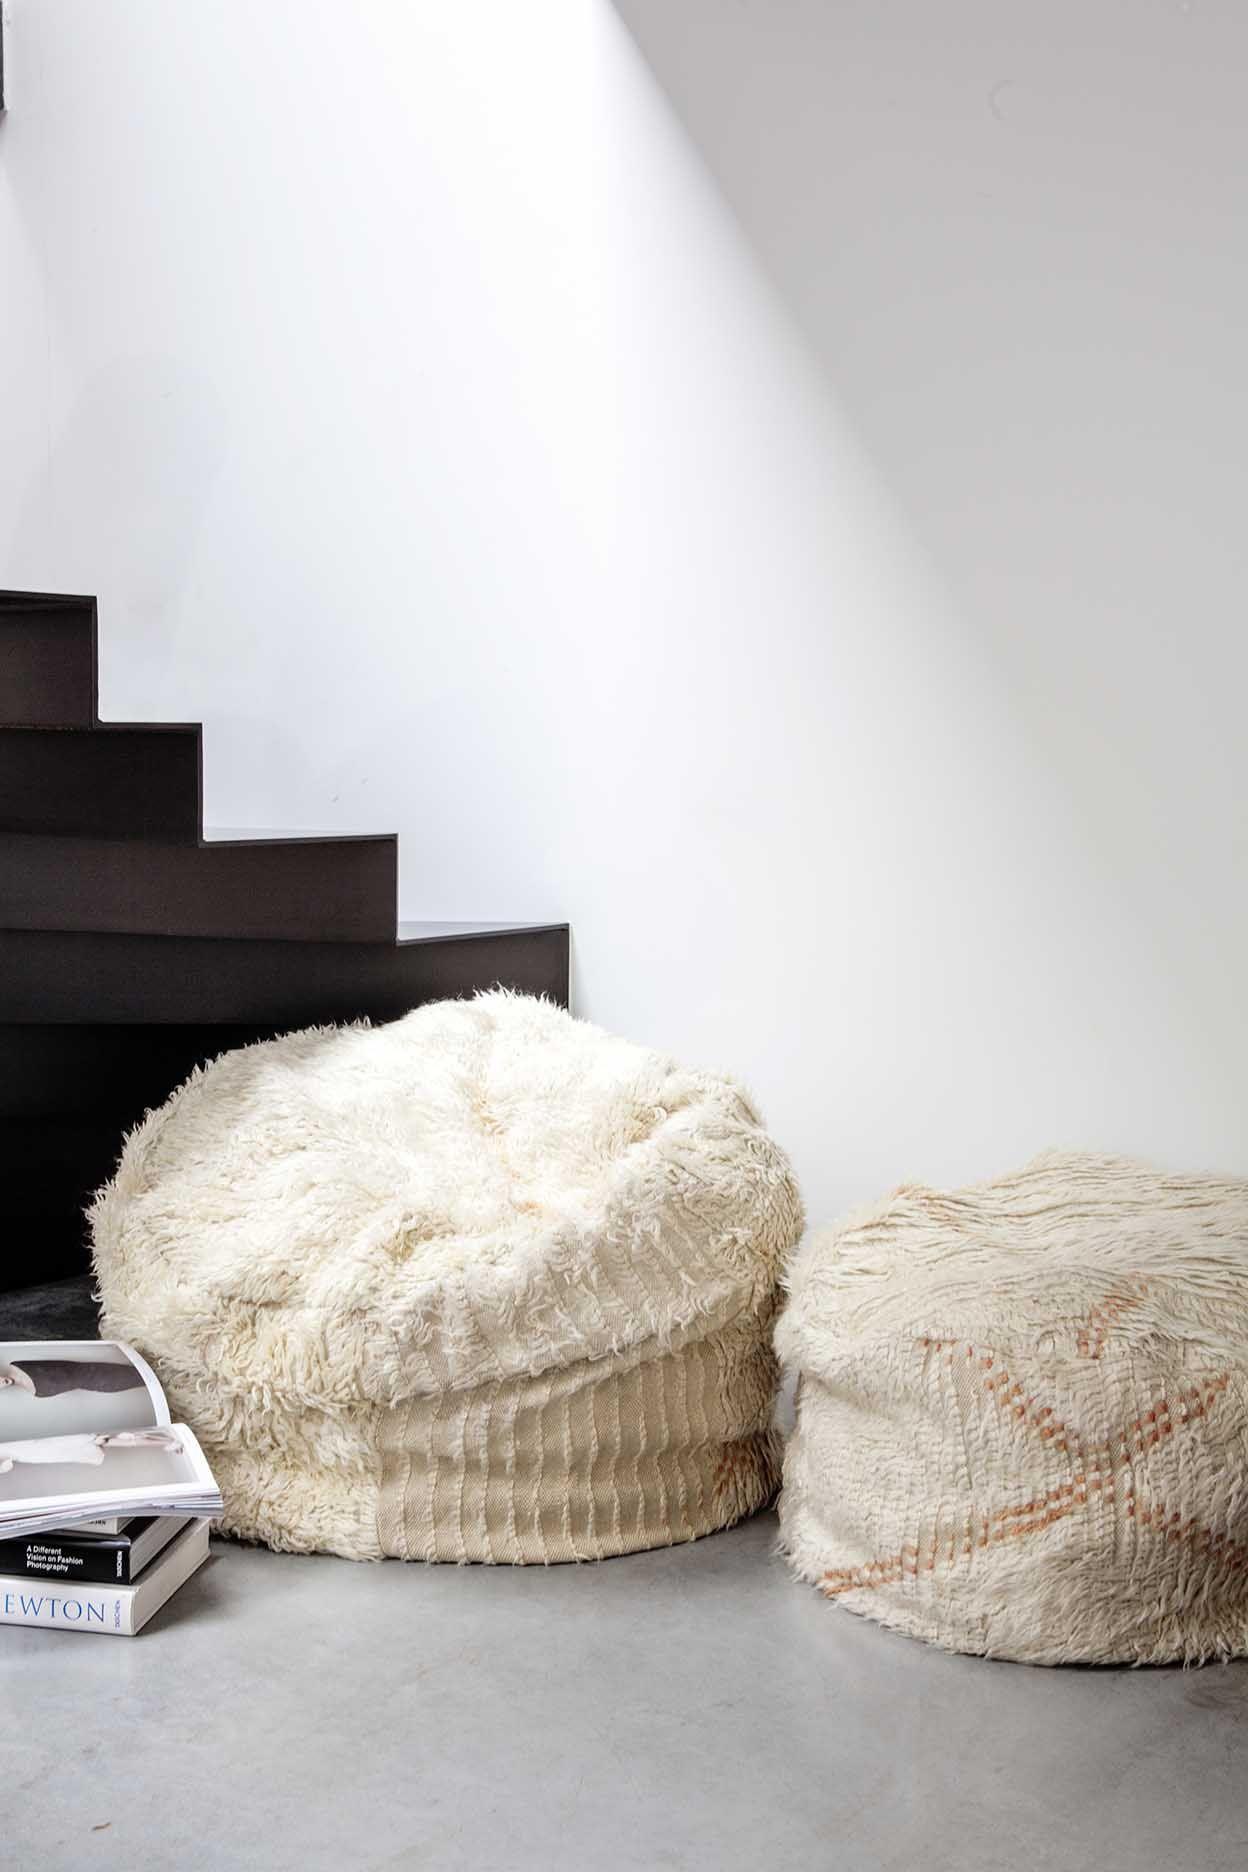 Azilal Floor Cushion No 23 Interior Interiorinspiration Polishedconcrete Interiordesign Indoorplant Designer Myhabitato Floor Cushions Azilal Cushions